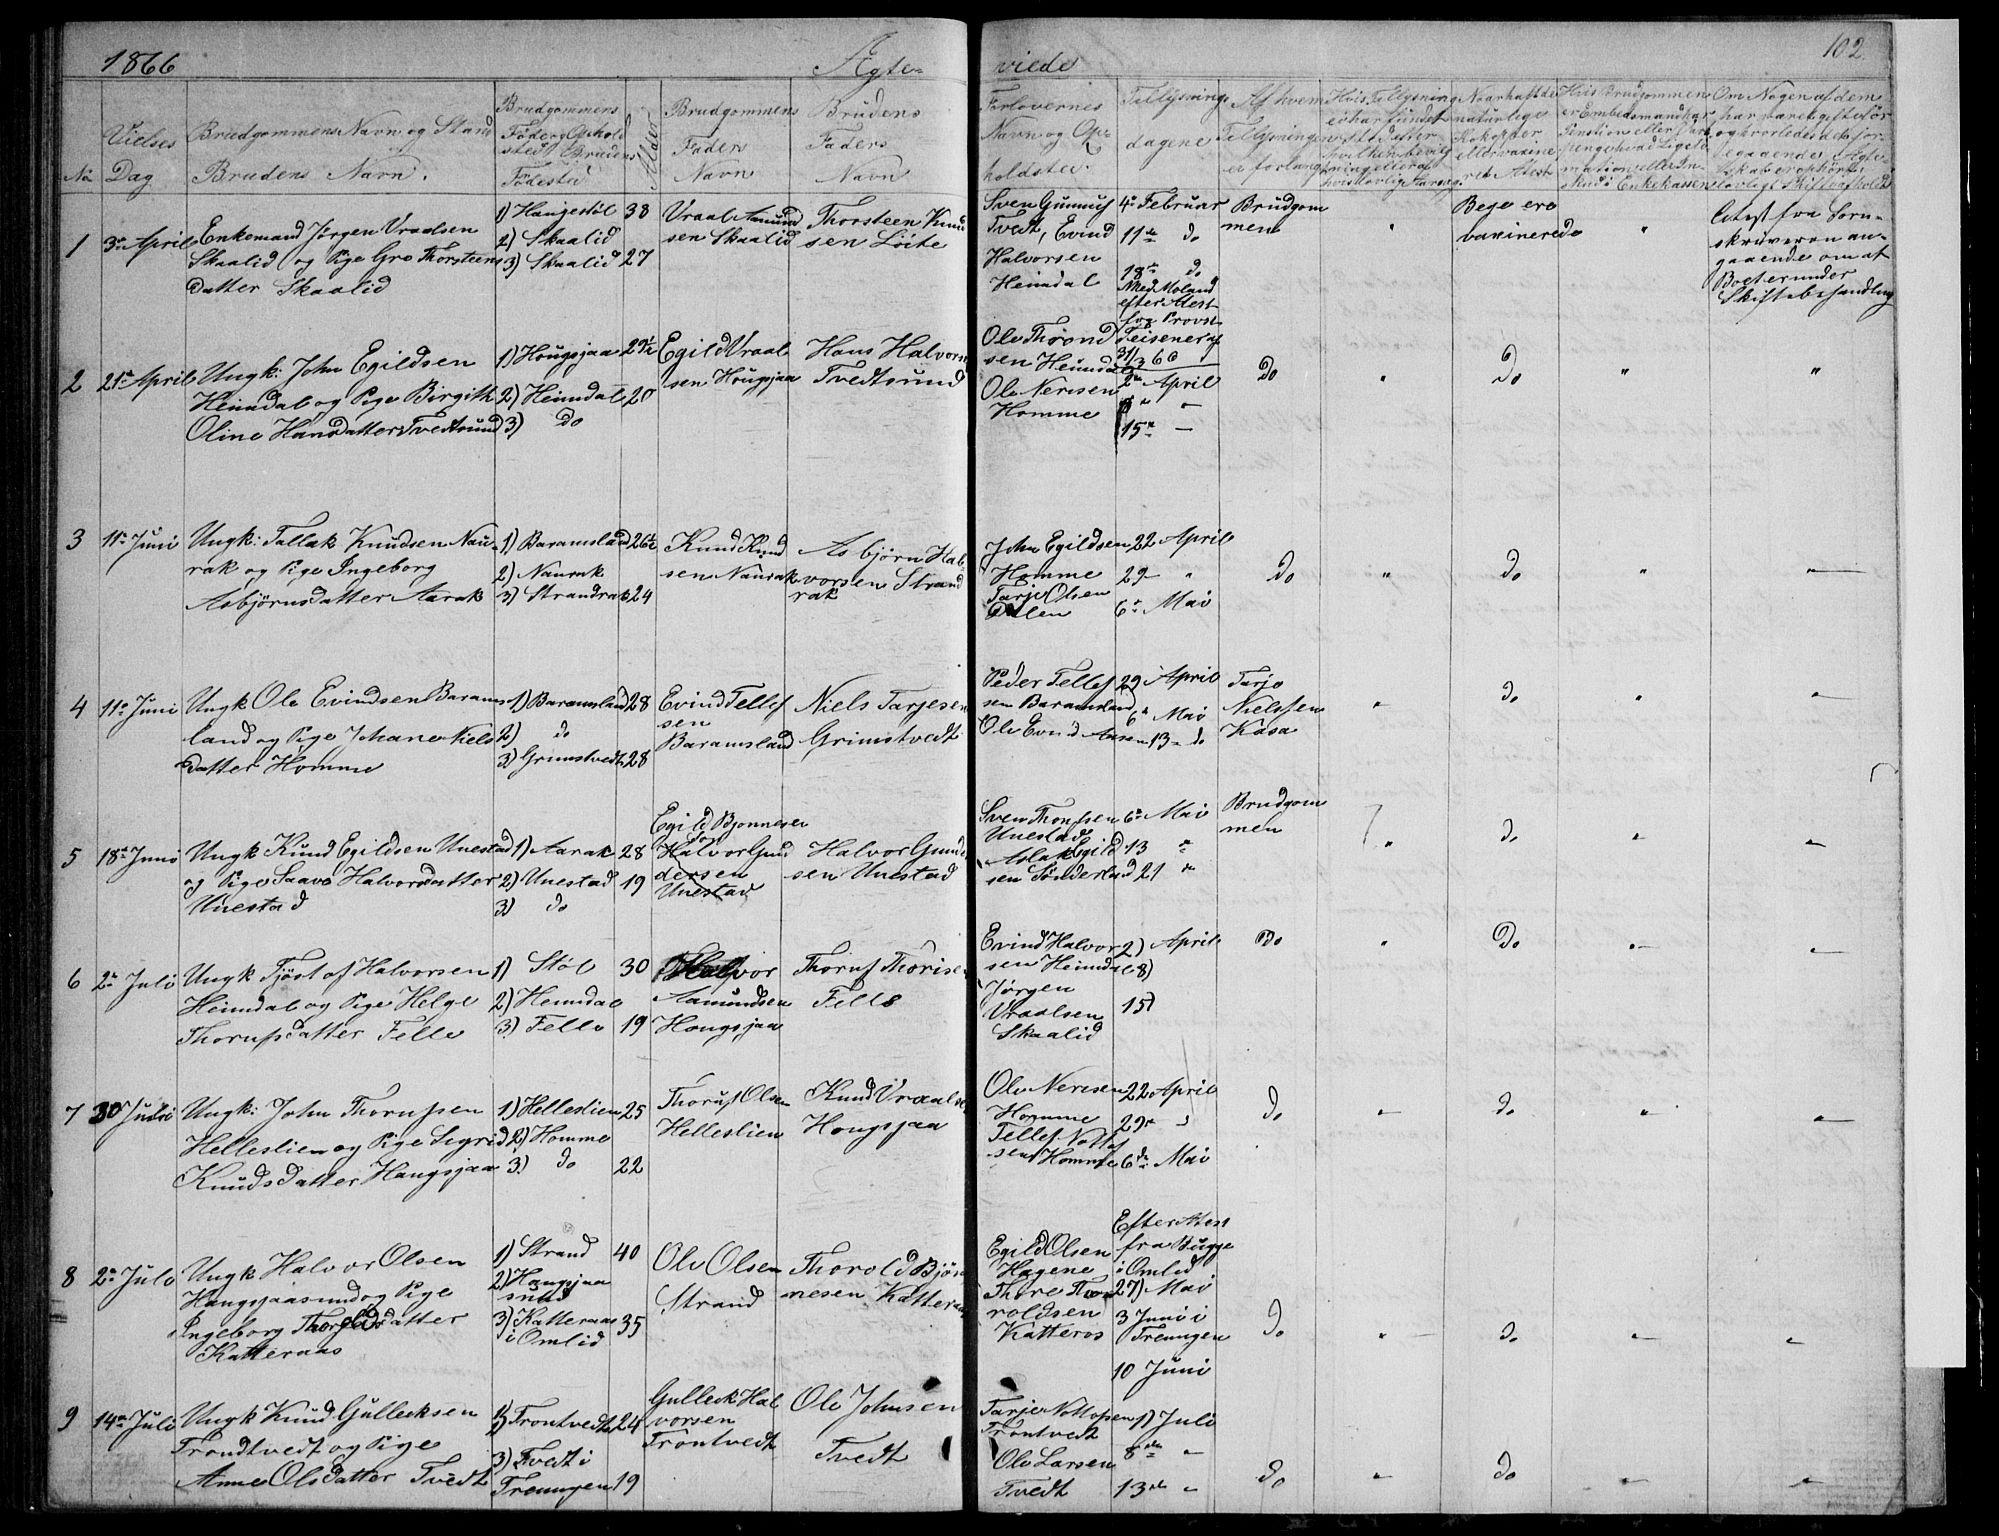 SAKO, Nissedal kirkebøker, G/Gb/L0002: Klokkerbok nr. II 2, 1863-1892, s. 102